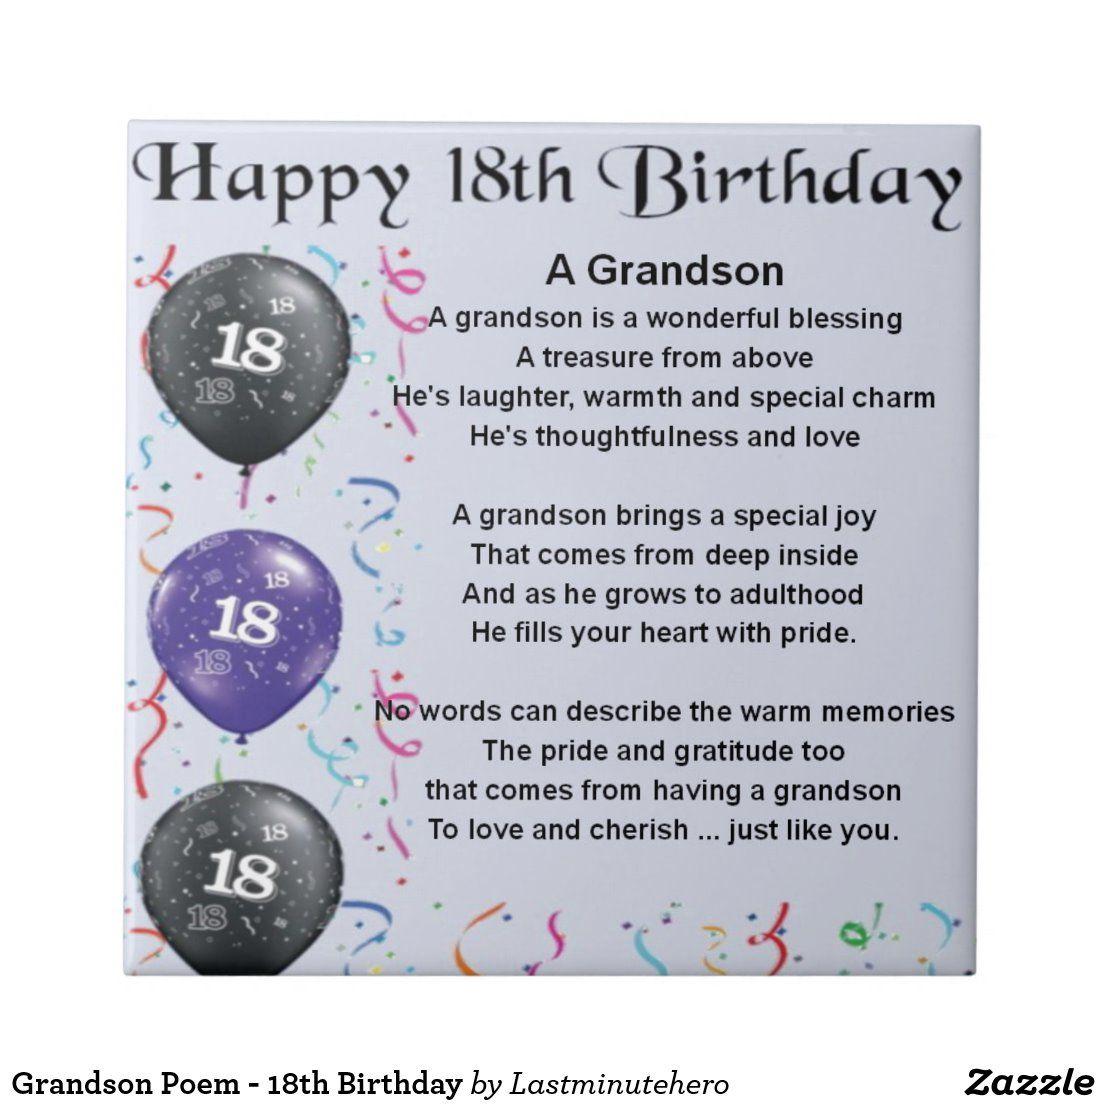 Grandson Poem 18th Birthday Tile Zazzle Com In 2020 With